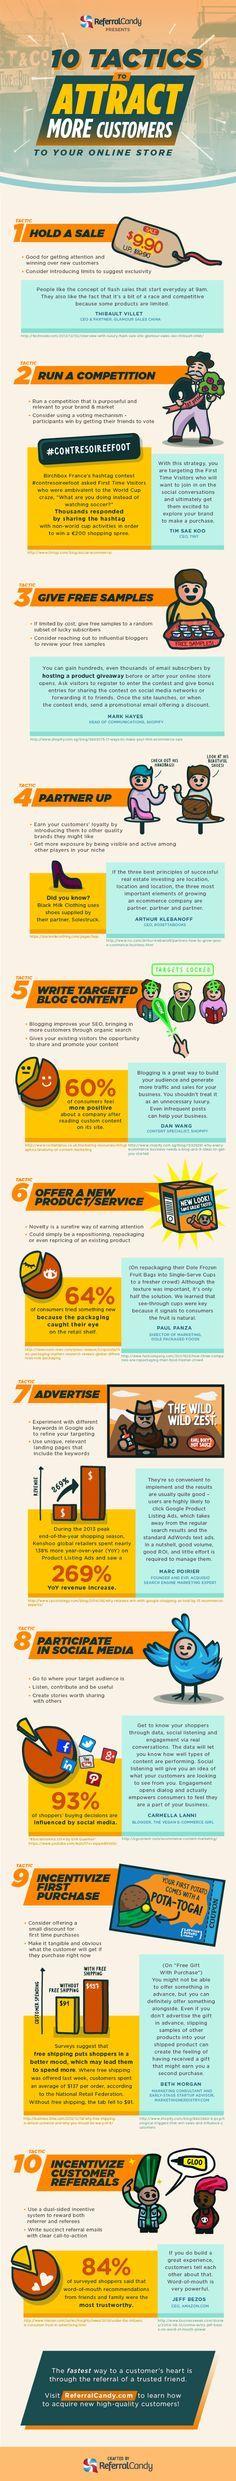 25 best Online Store & Ecommerce Marketing images on Pinterest ...